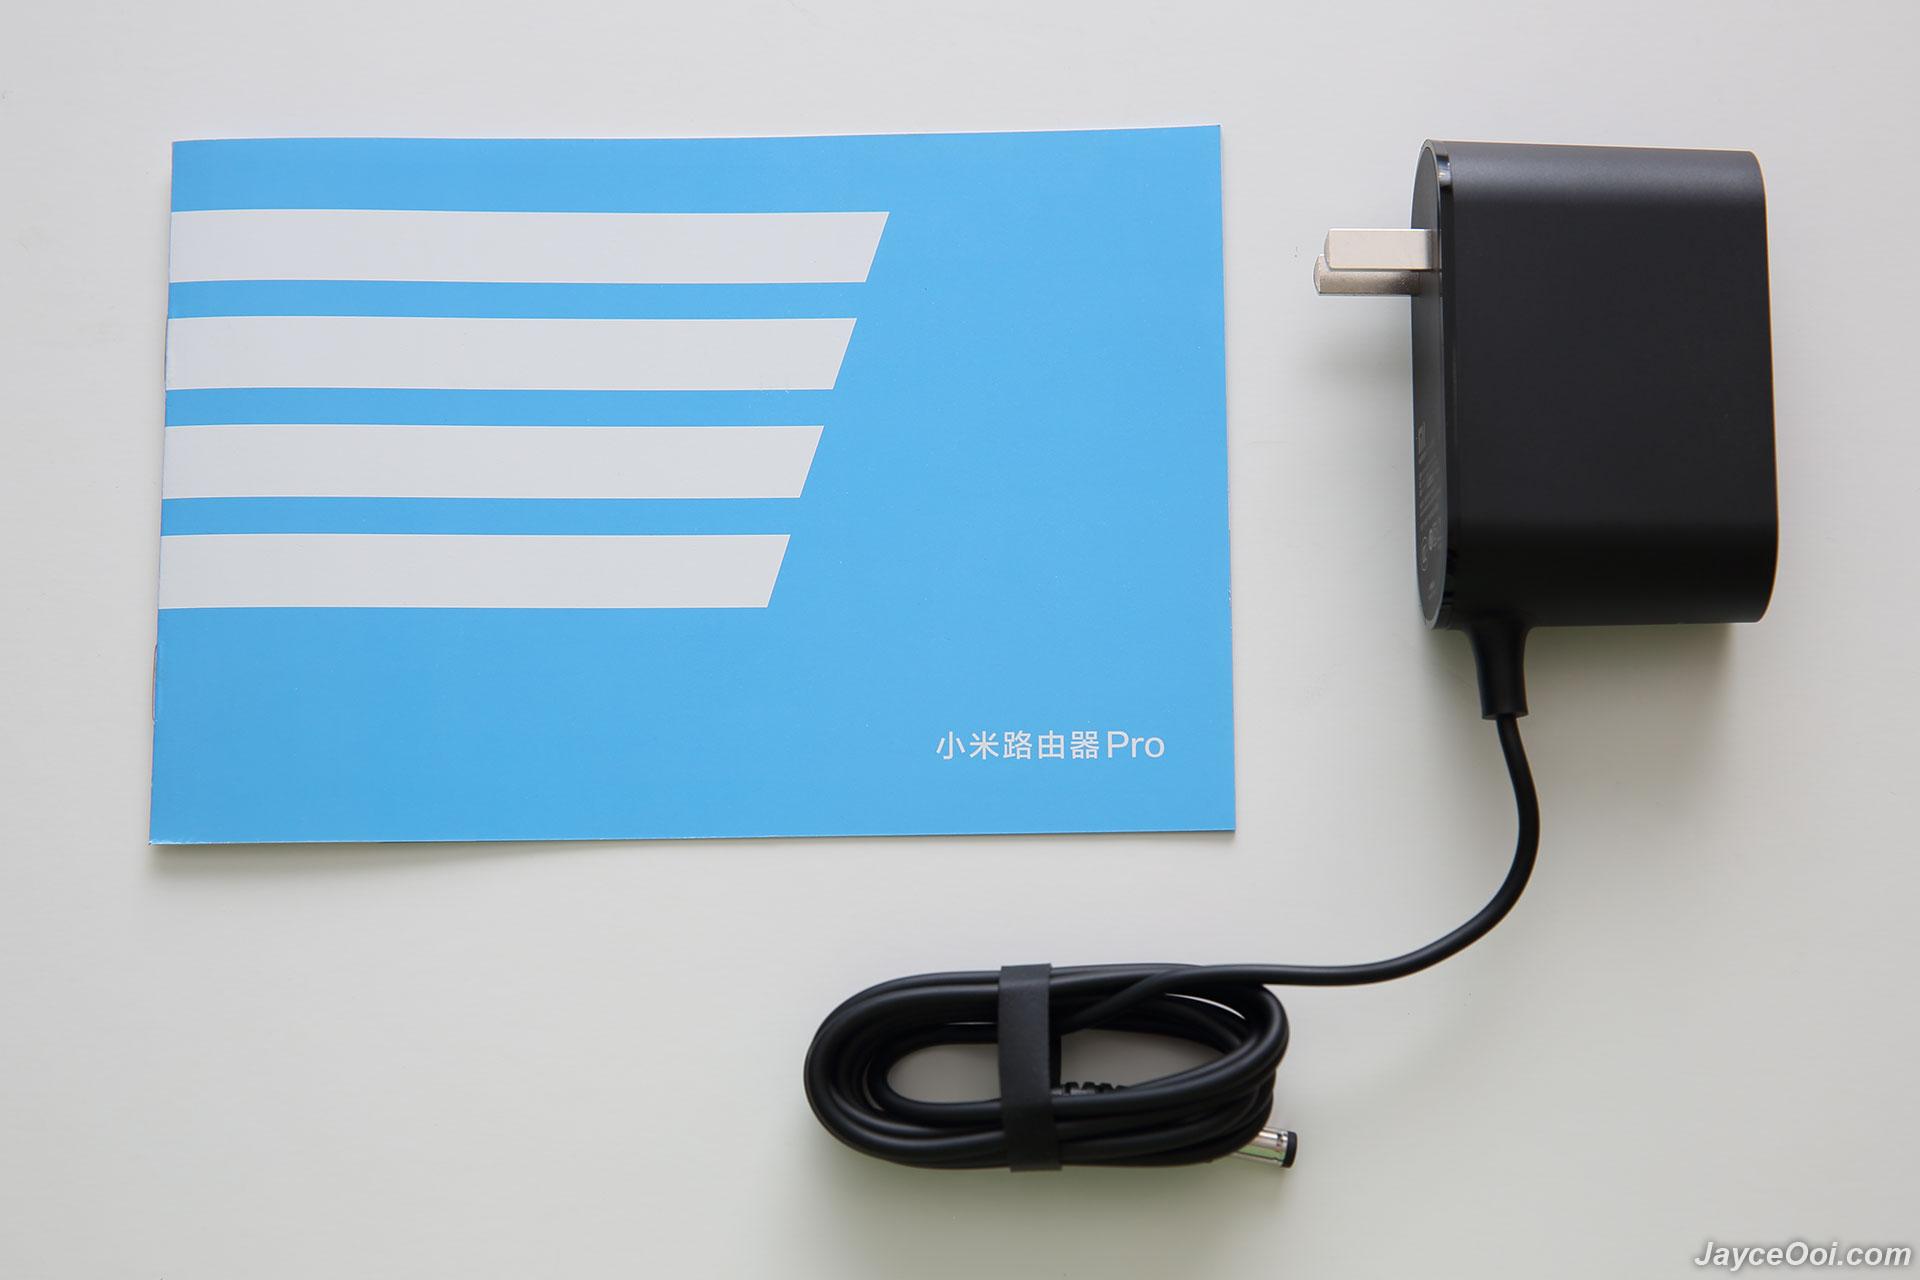 xiaomi mi router 4 user manual